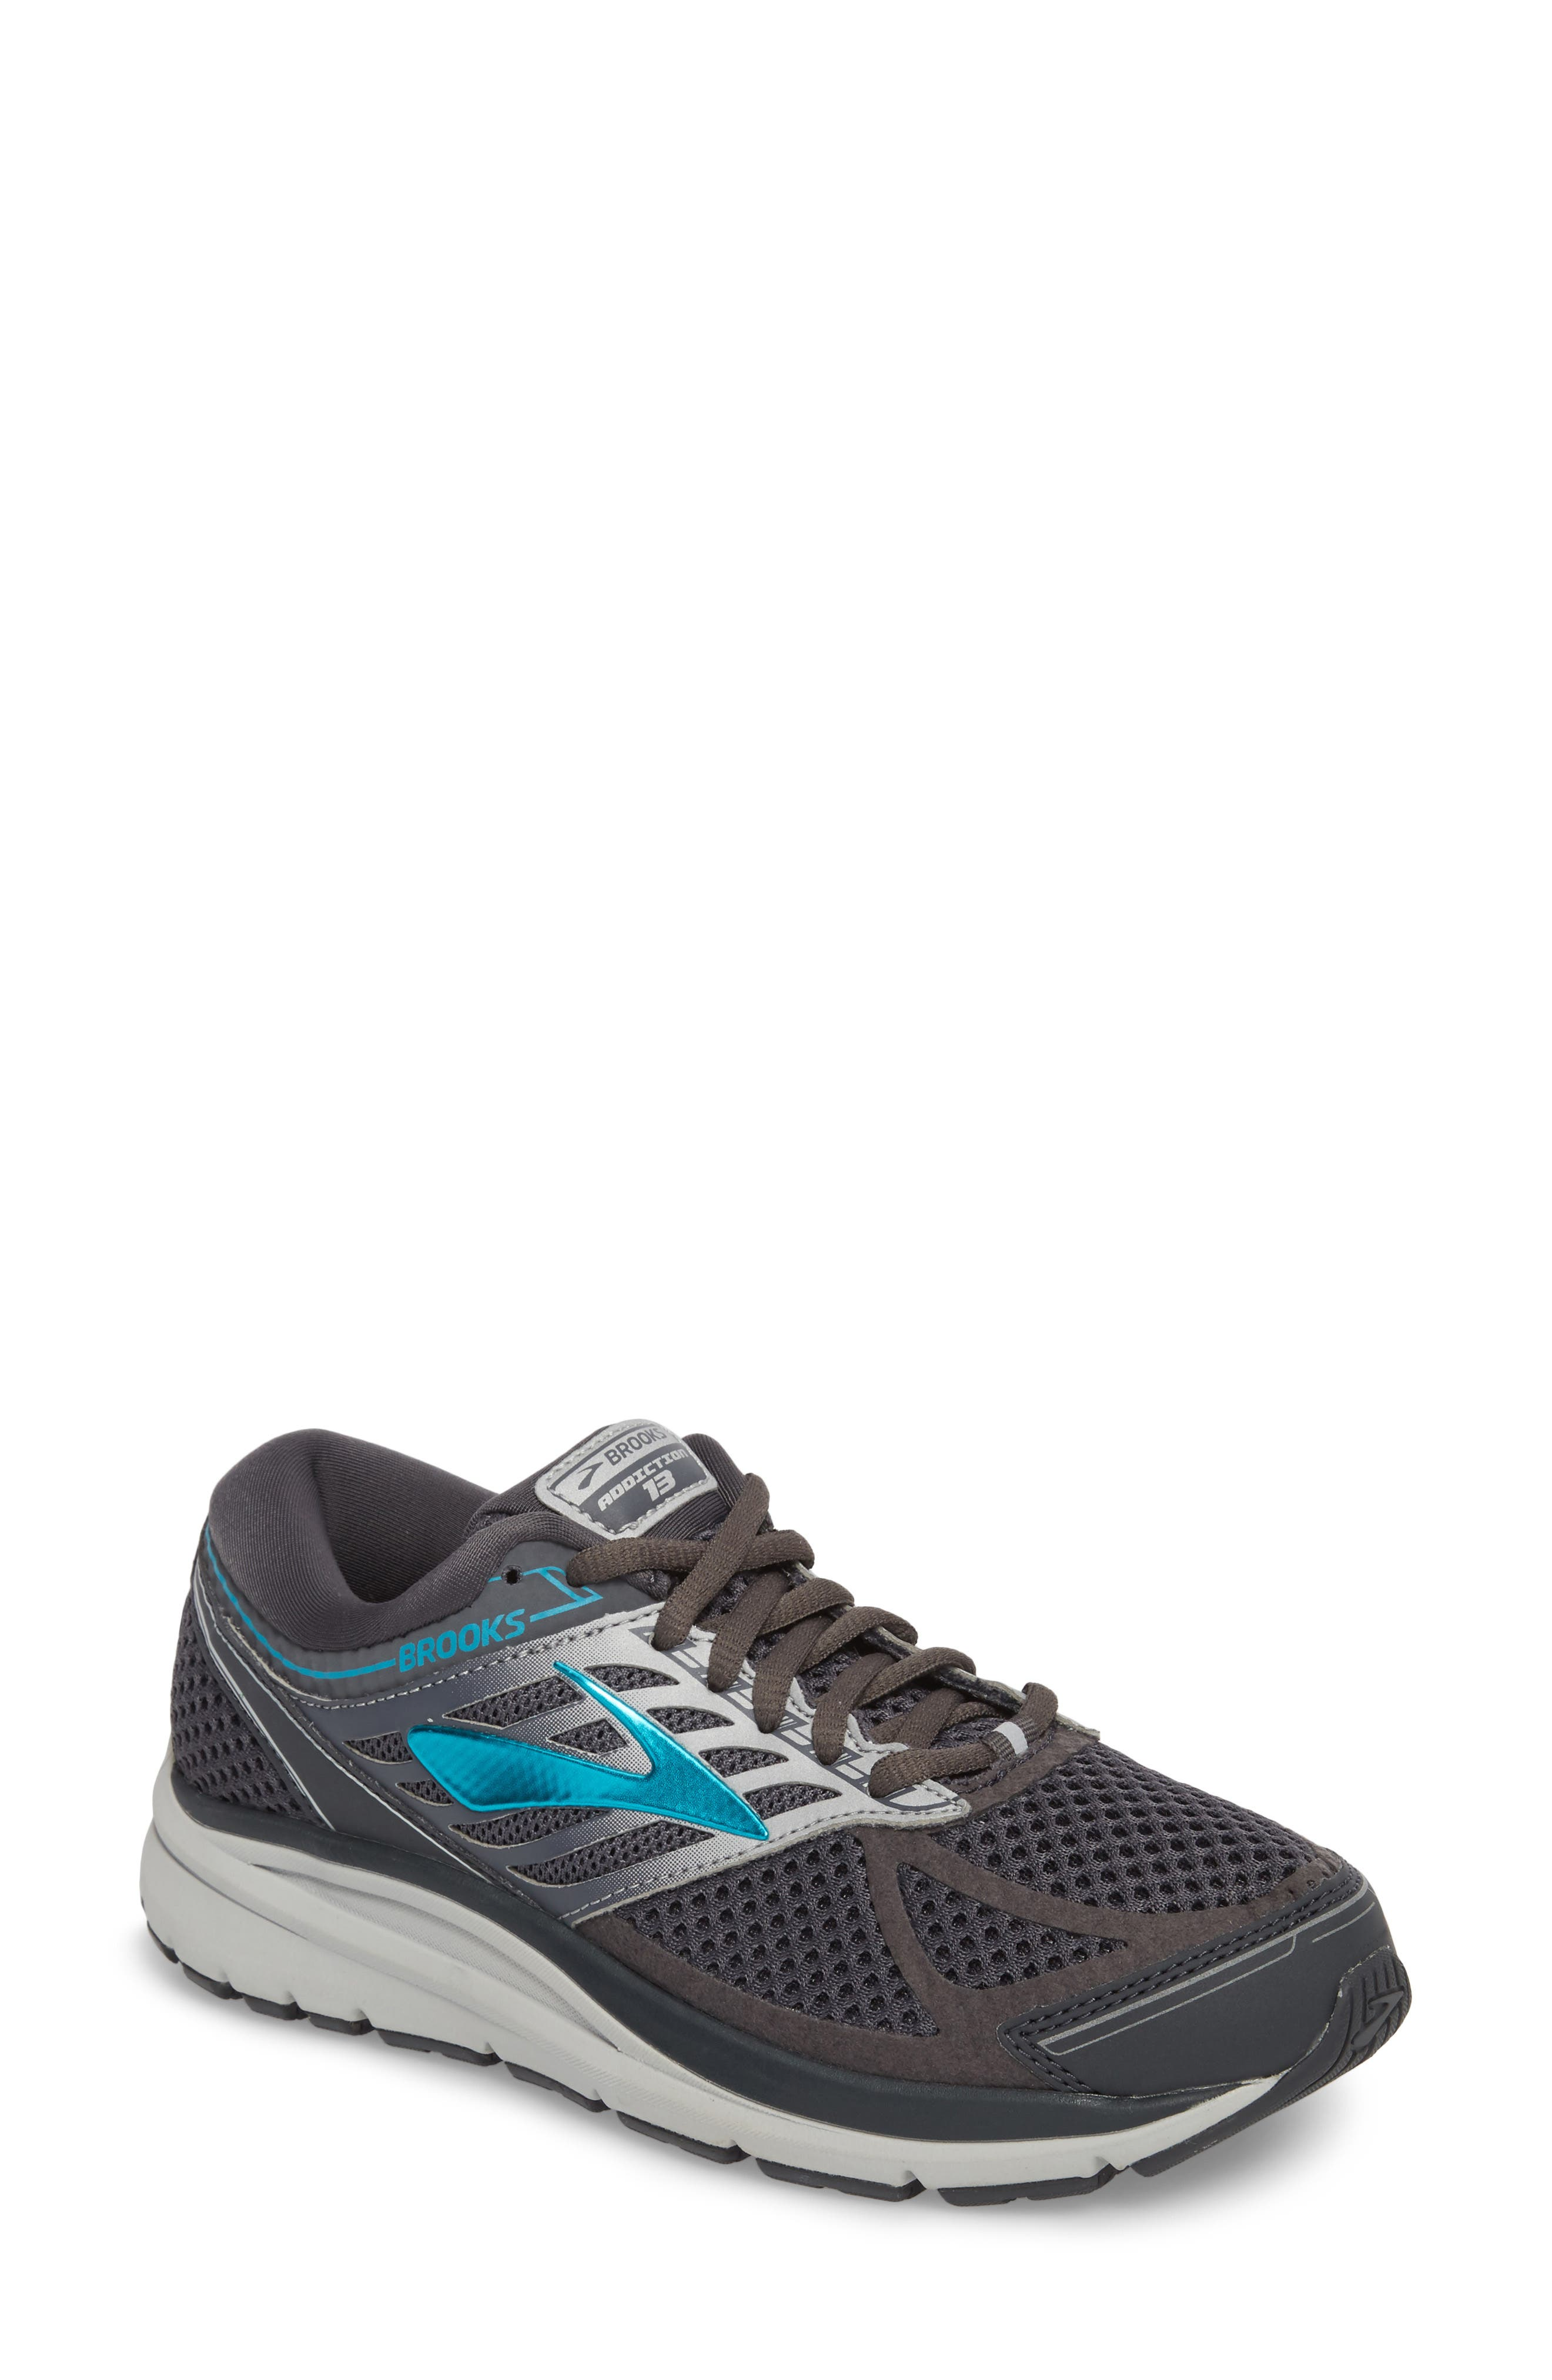 Addiction 13 Running Shoe,                         Main,                         color, Ebony/ Silver/ Pagoda Blue